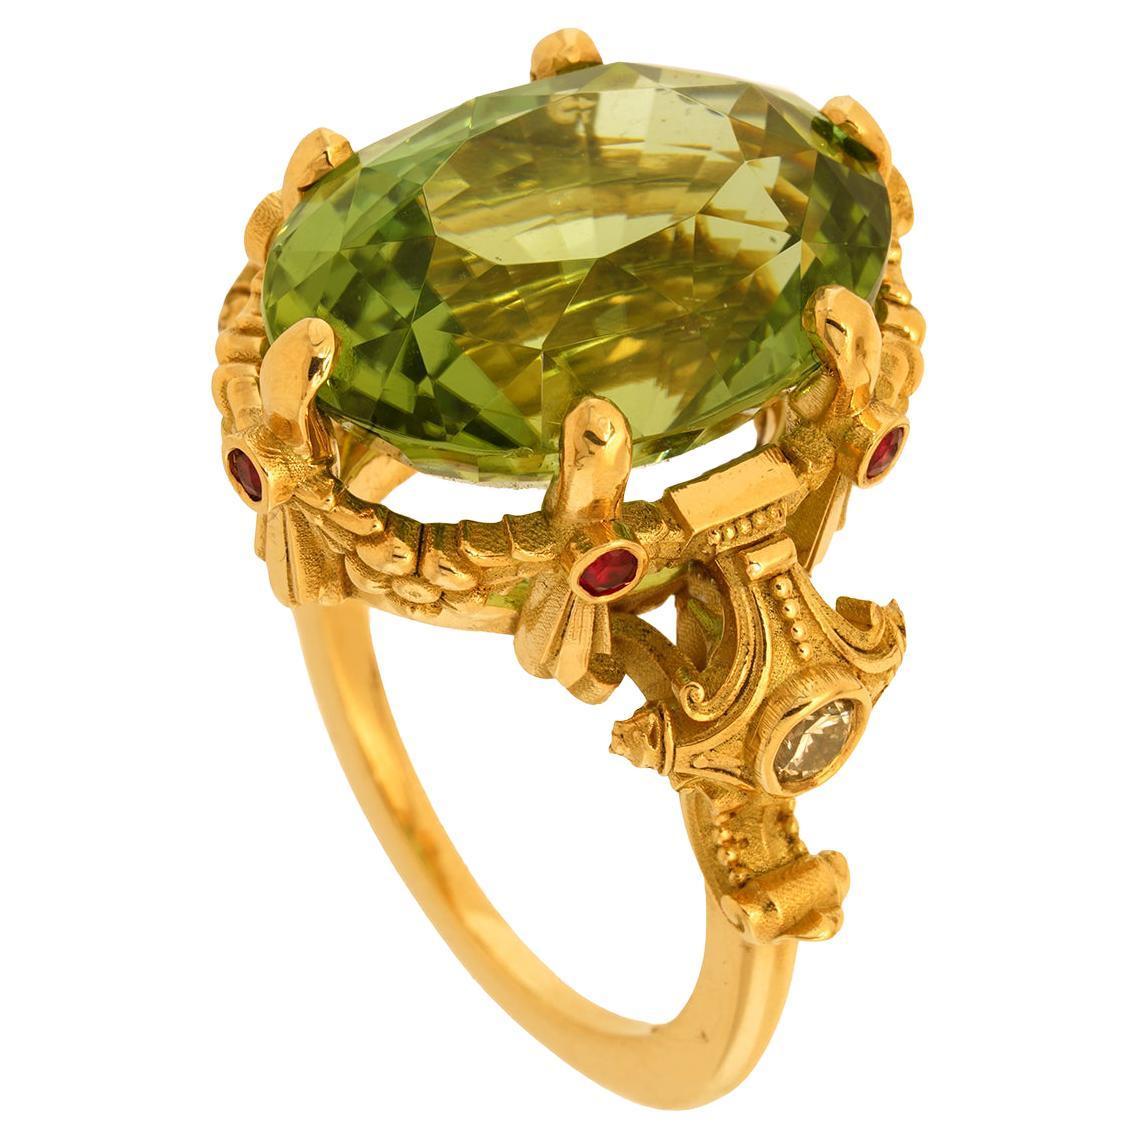 Mantle of Chronos Ring 18kt Yellow Gold, Green Tourmaline, Rubies White Diamonds